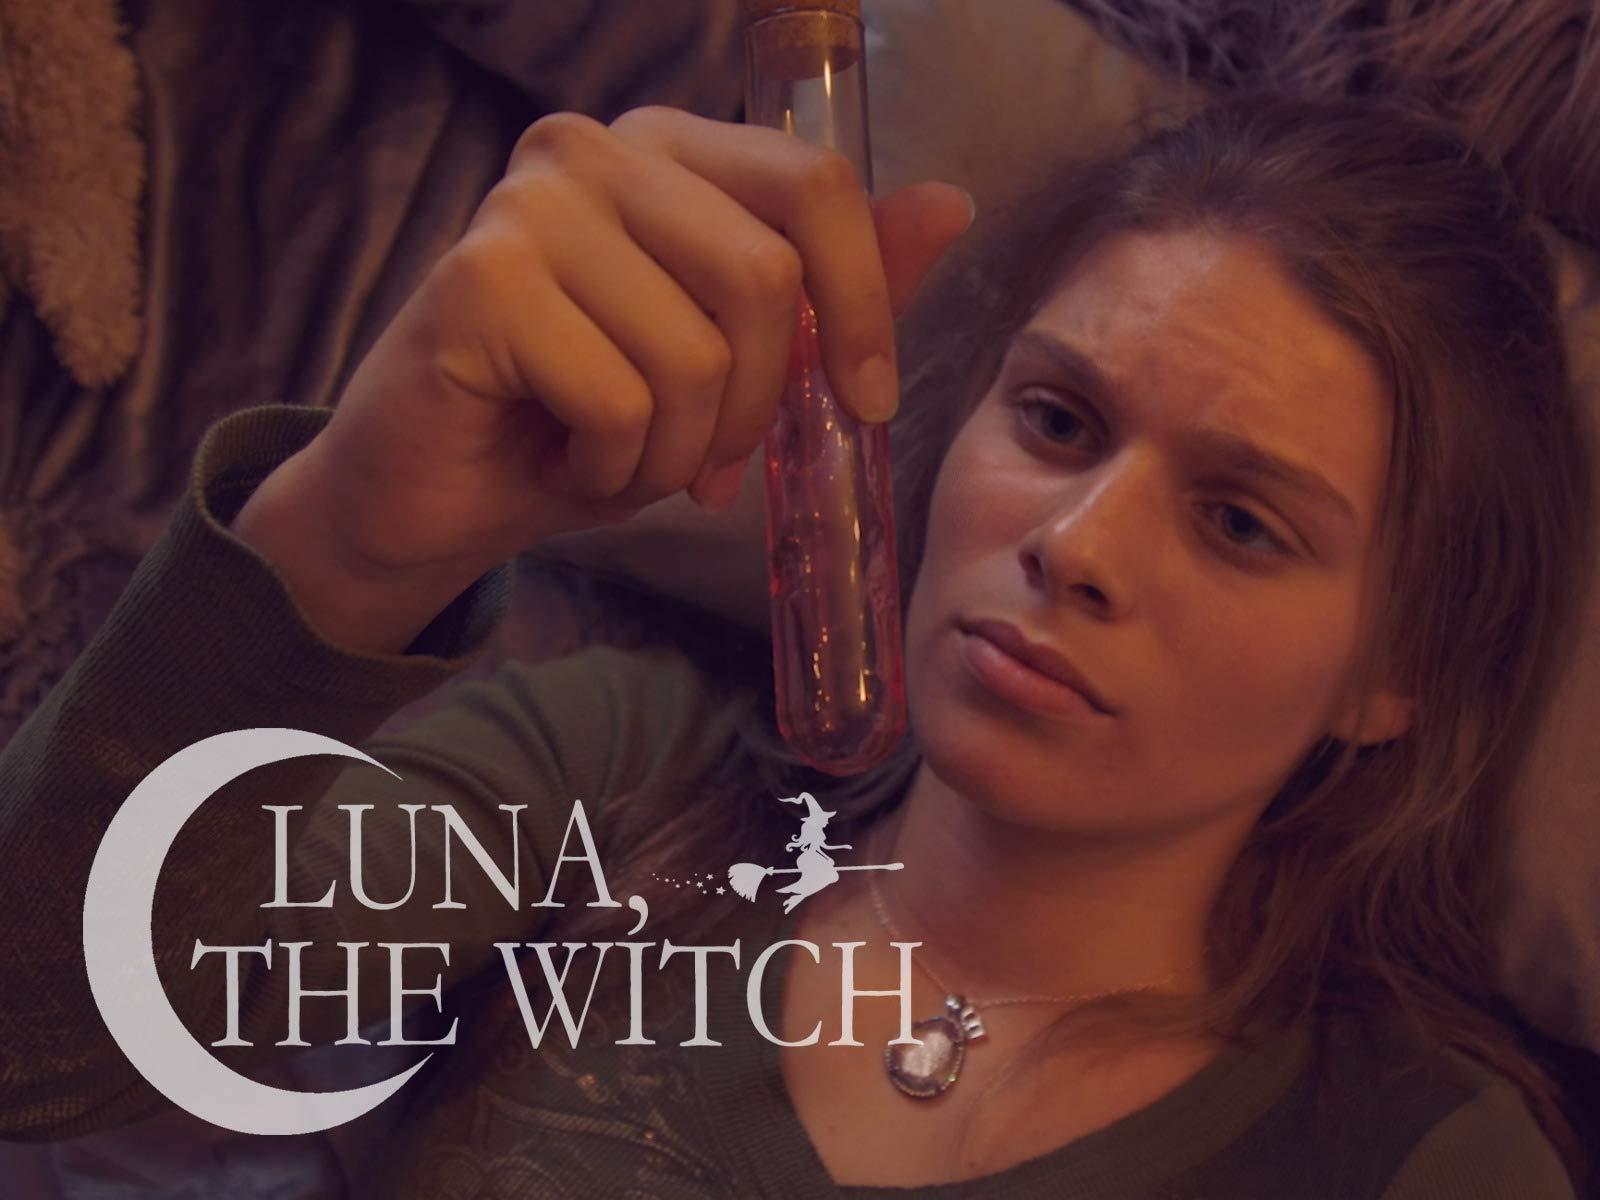 Luna, The Witch